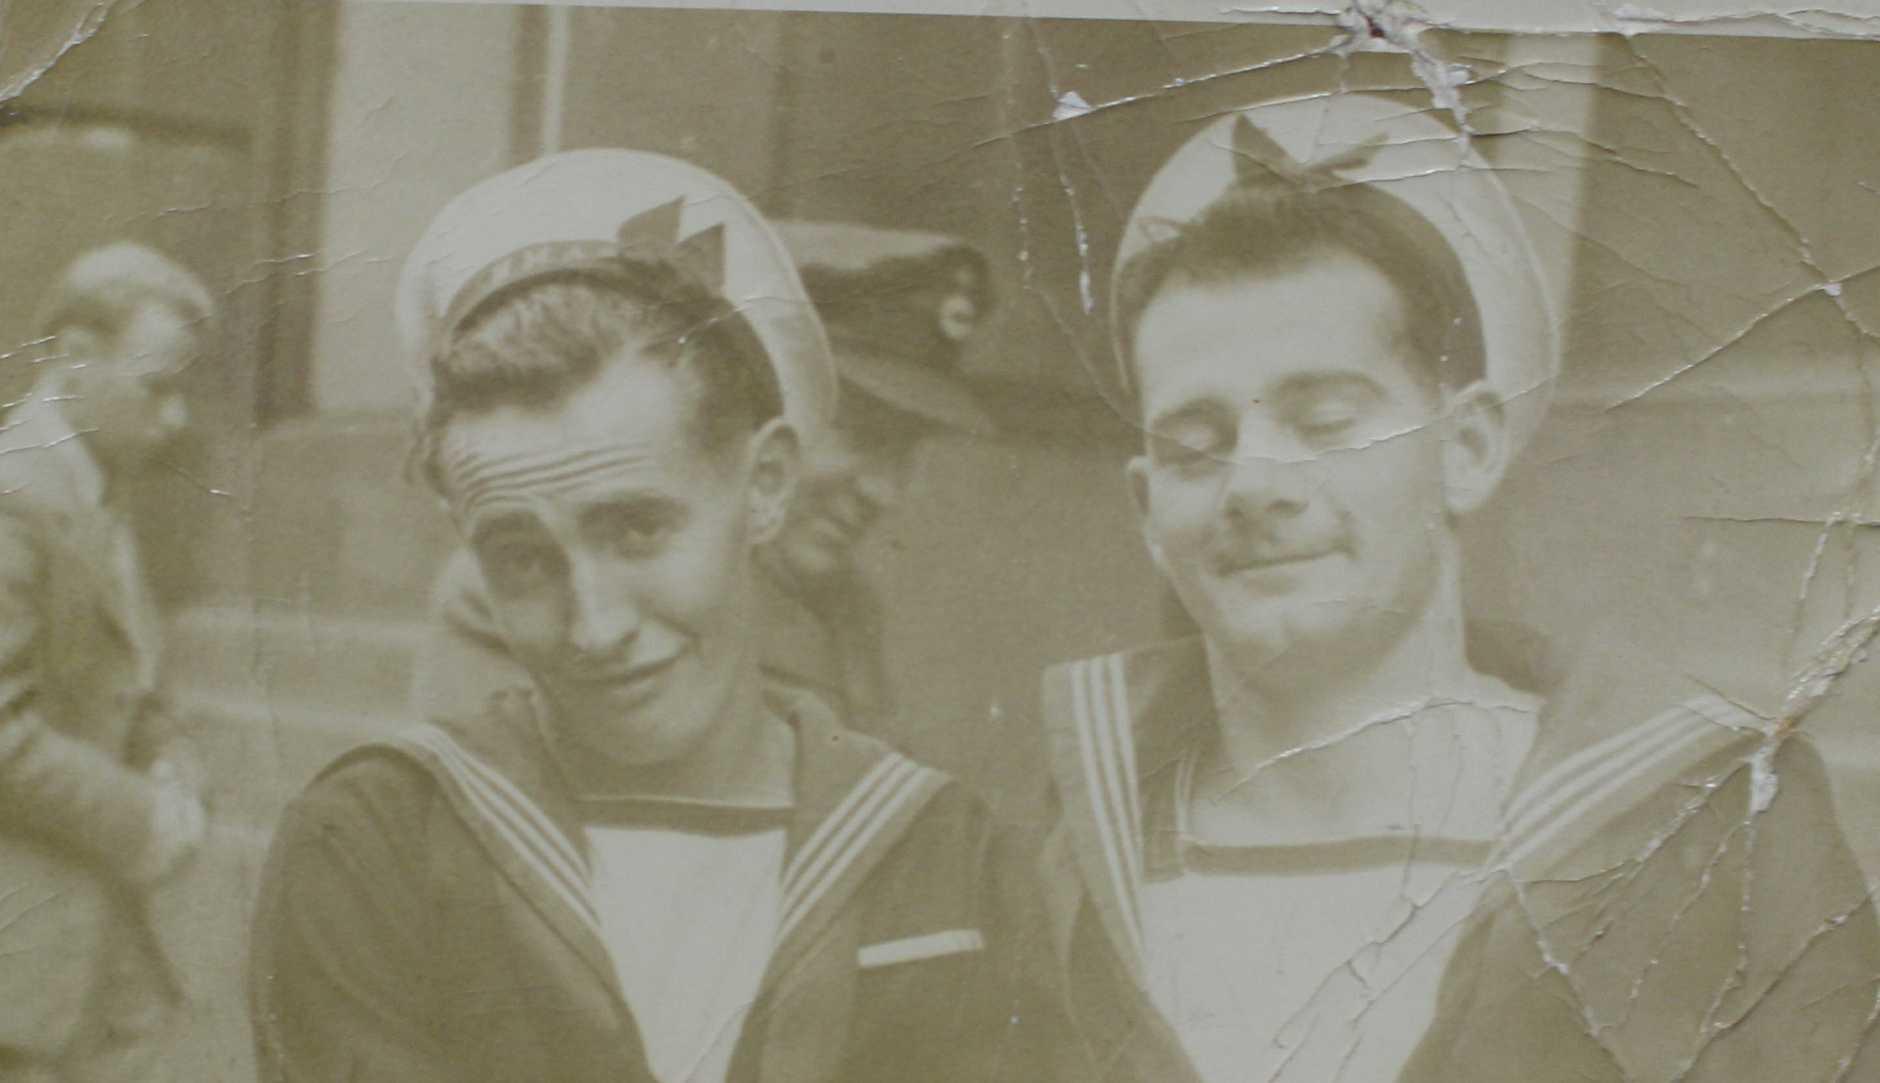 Ken and Gordon Davies, 1947.